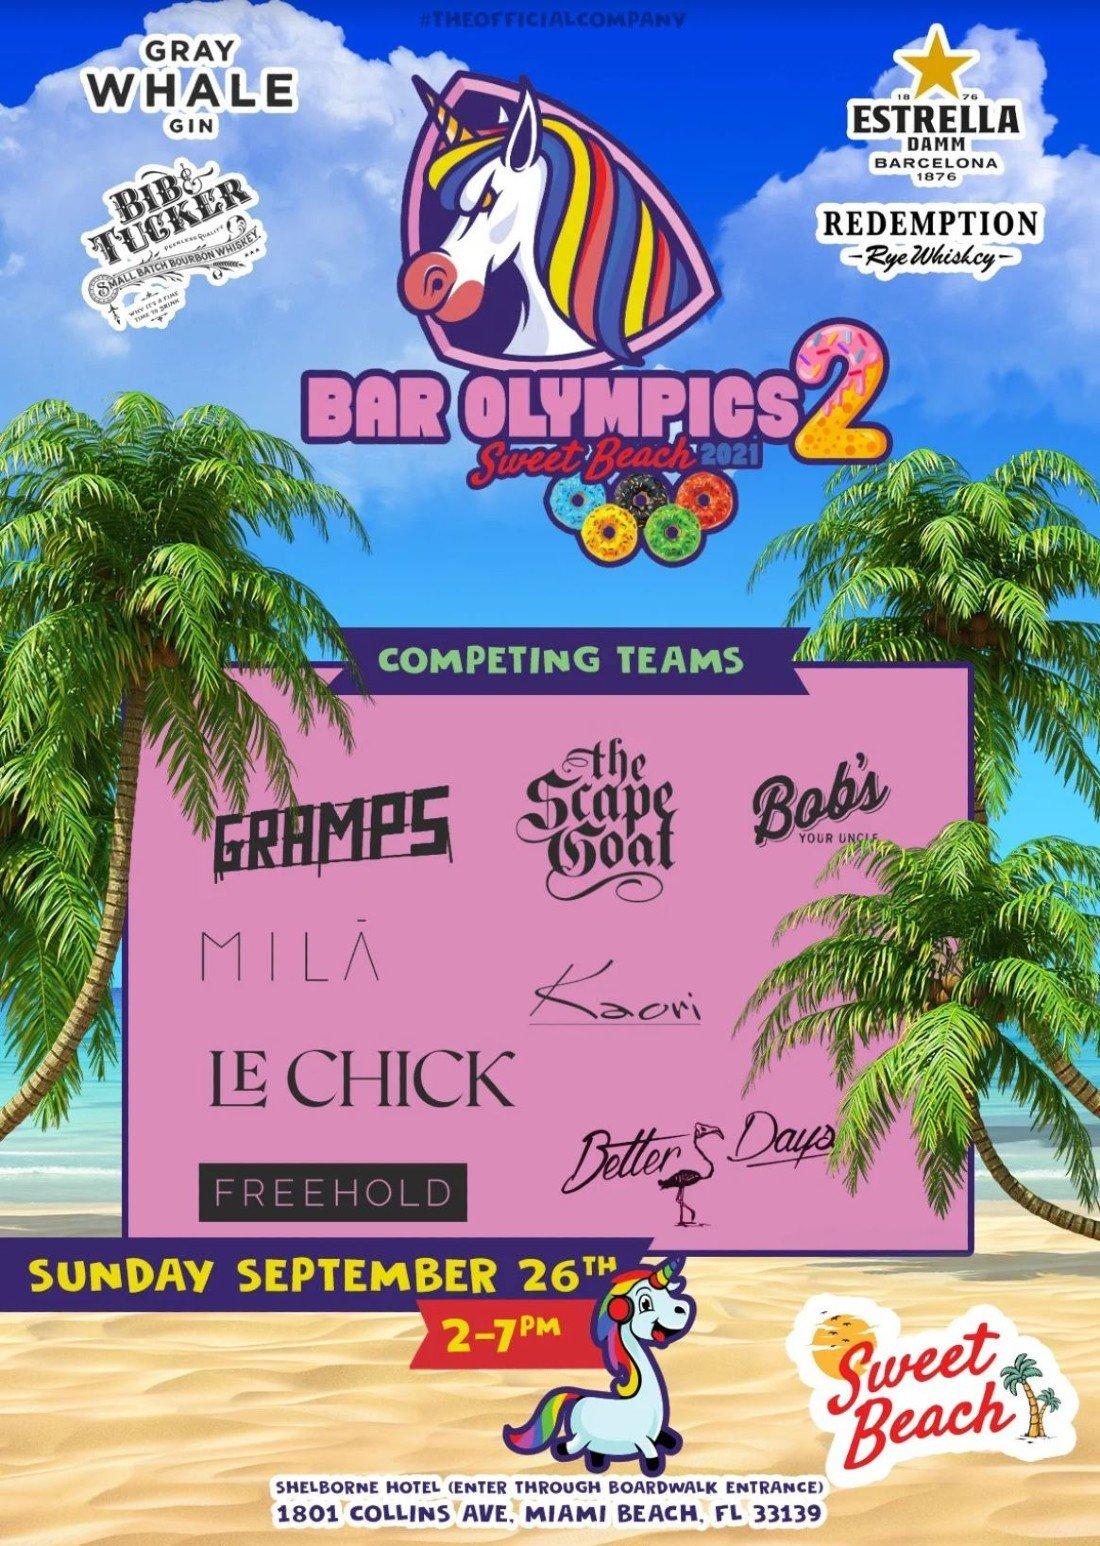 Sweet Beach\u2019s 2021 Bar Olympics